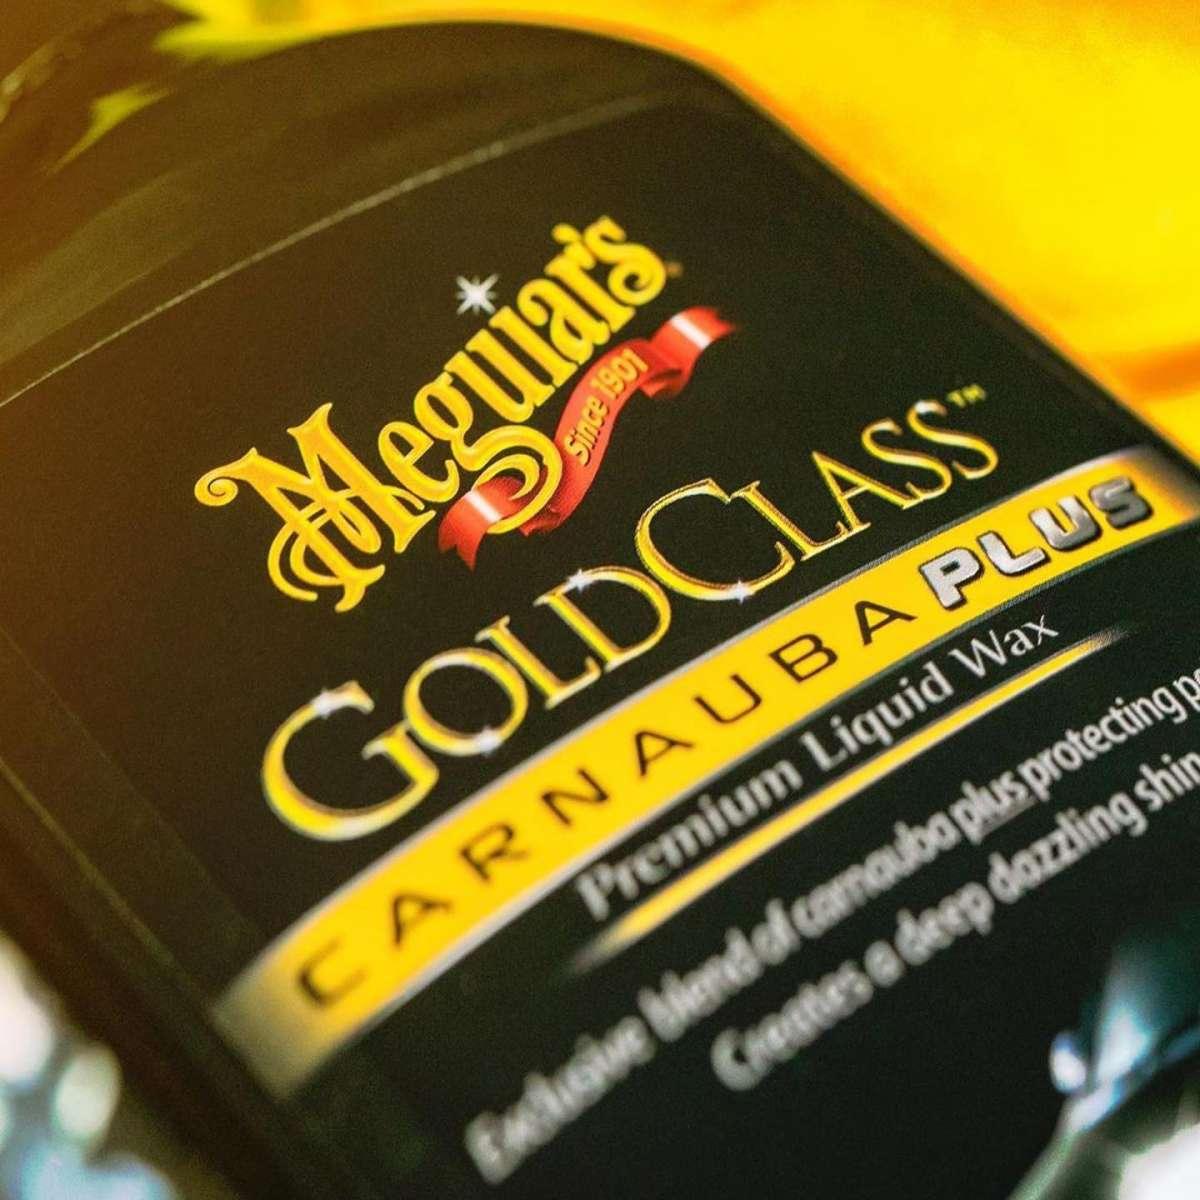 Meguiar's Gold Class Carnauba Plus Premium Liquid Wax